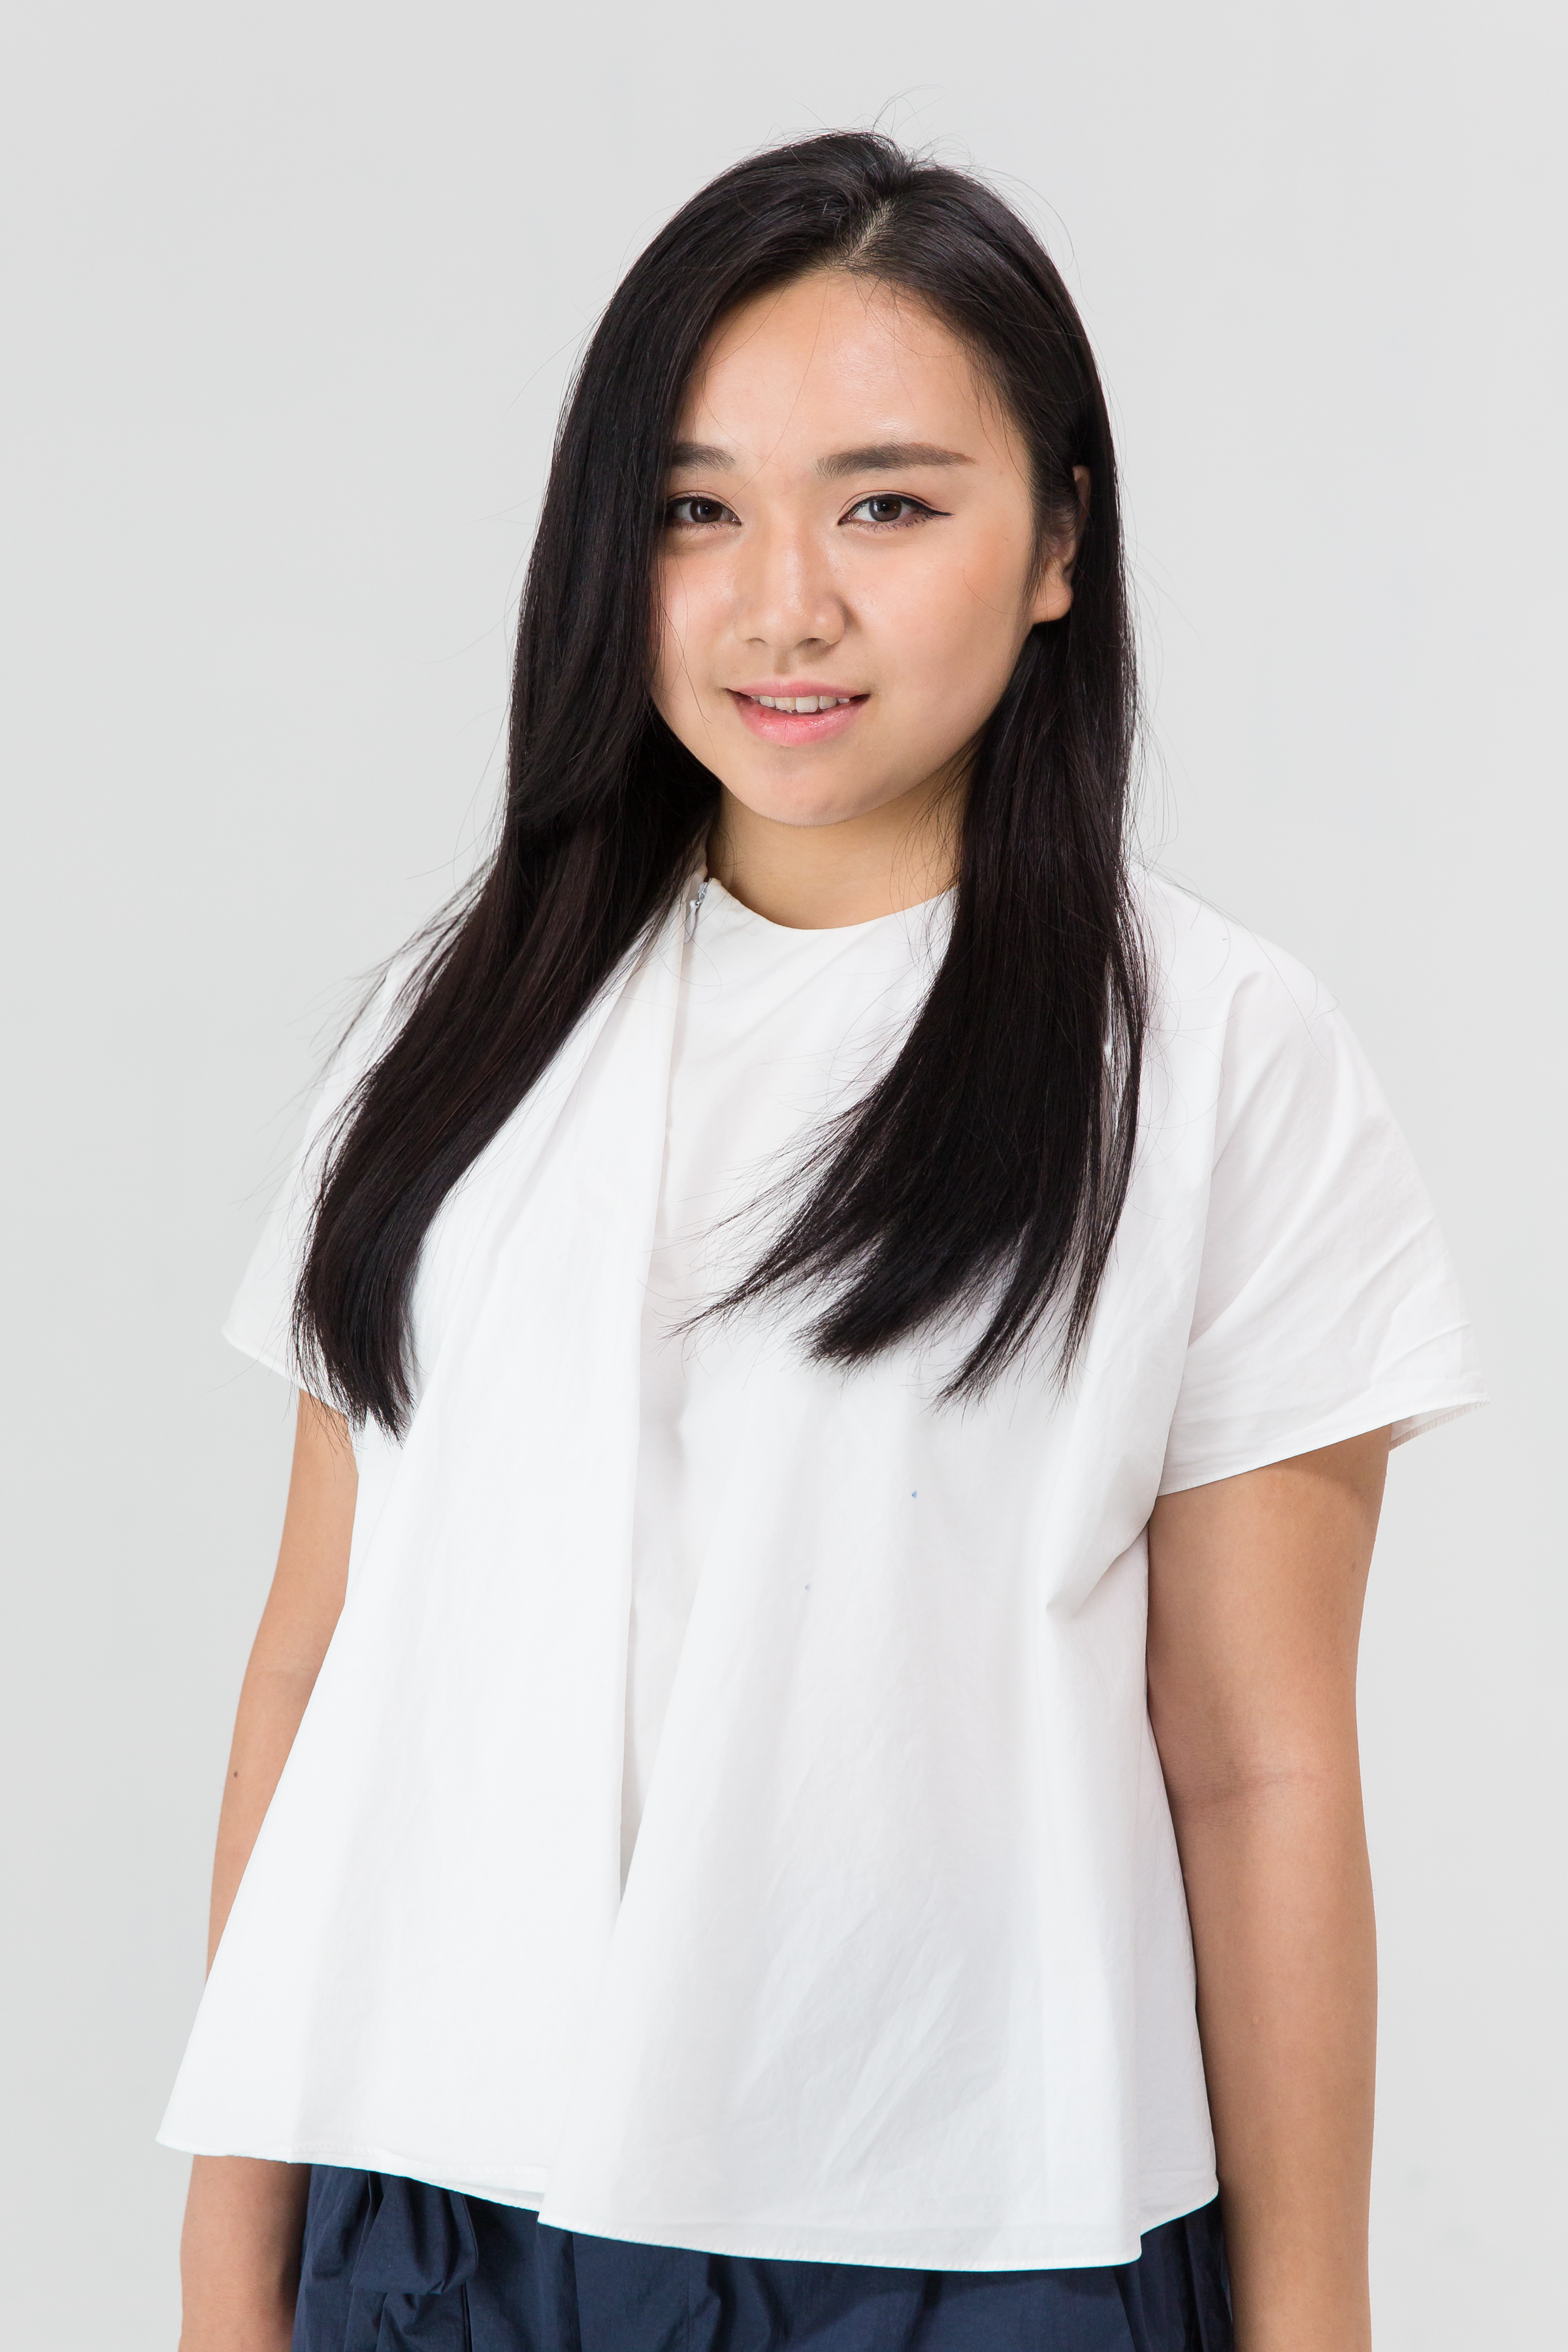 jacqueline-chen-headshot